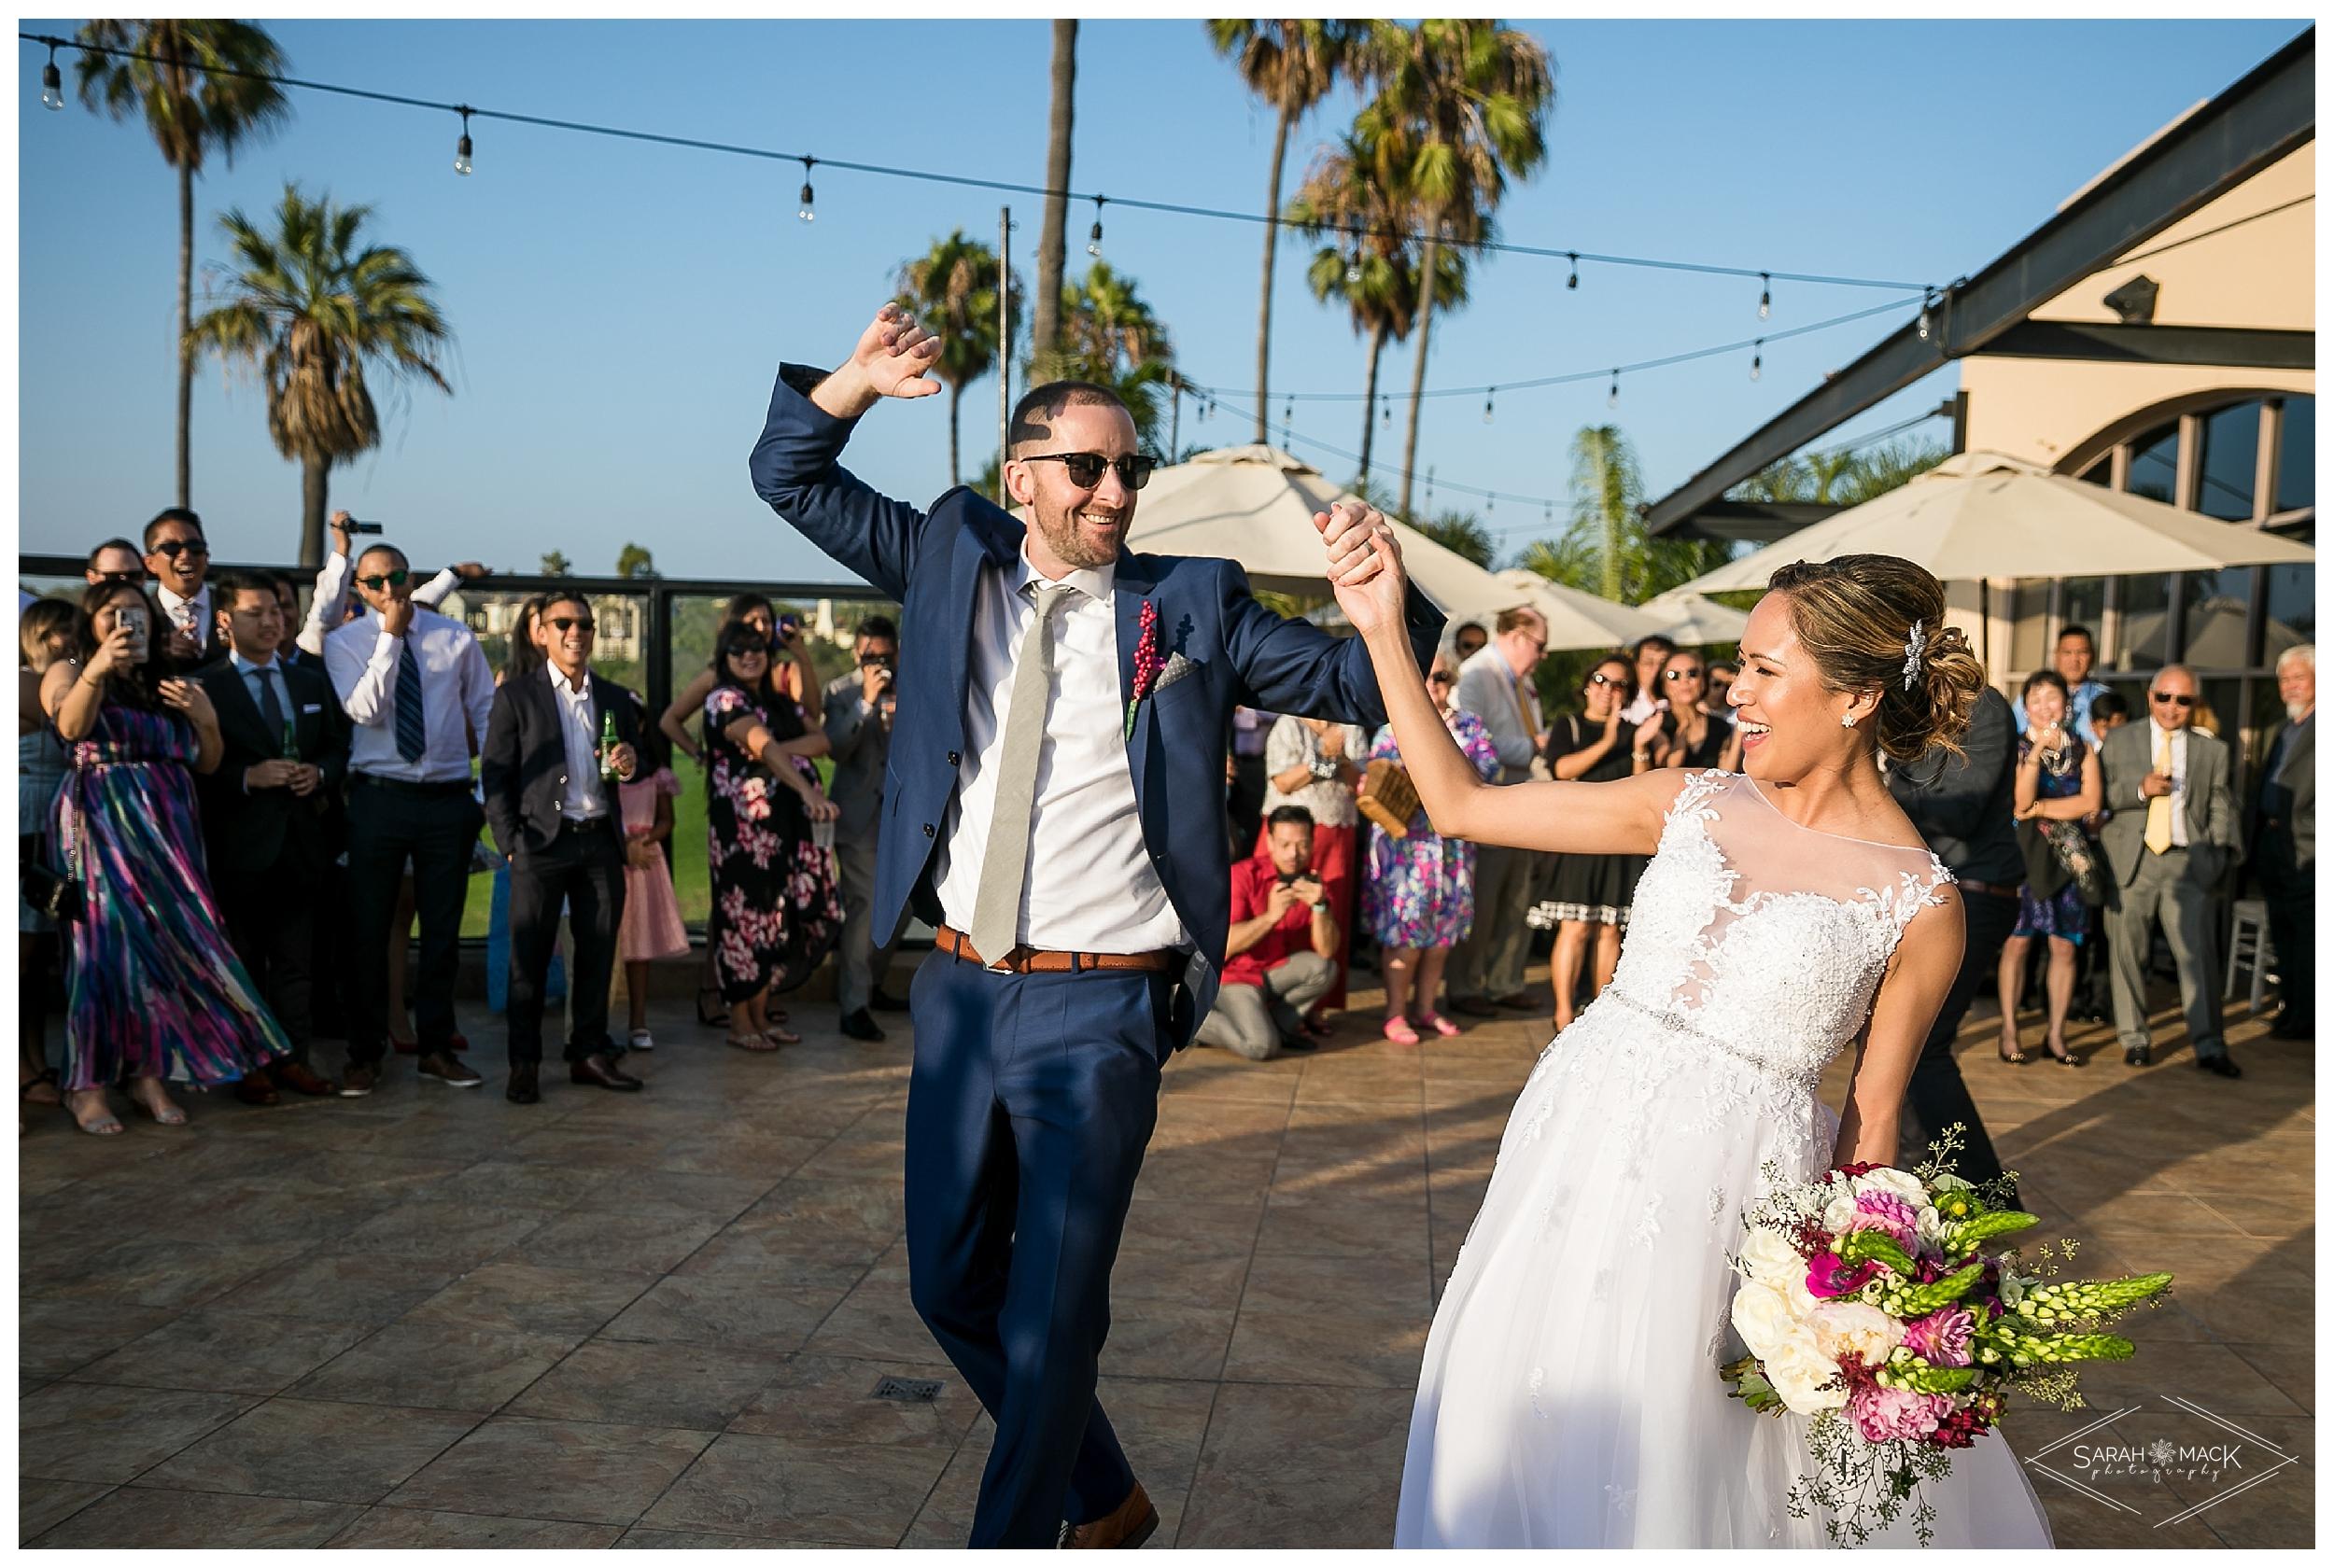 MR-Sea-Cliffe-Country-Club-Huntington-Beach-Wedding-0130.jpg